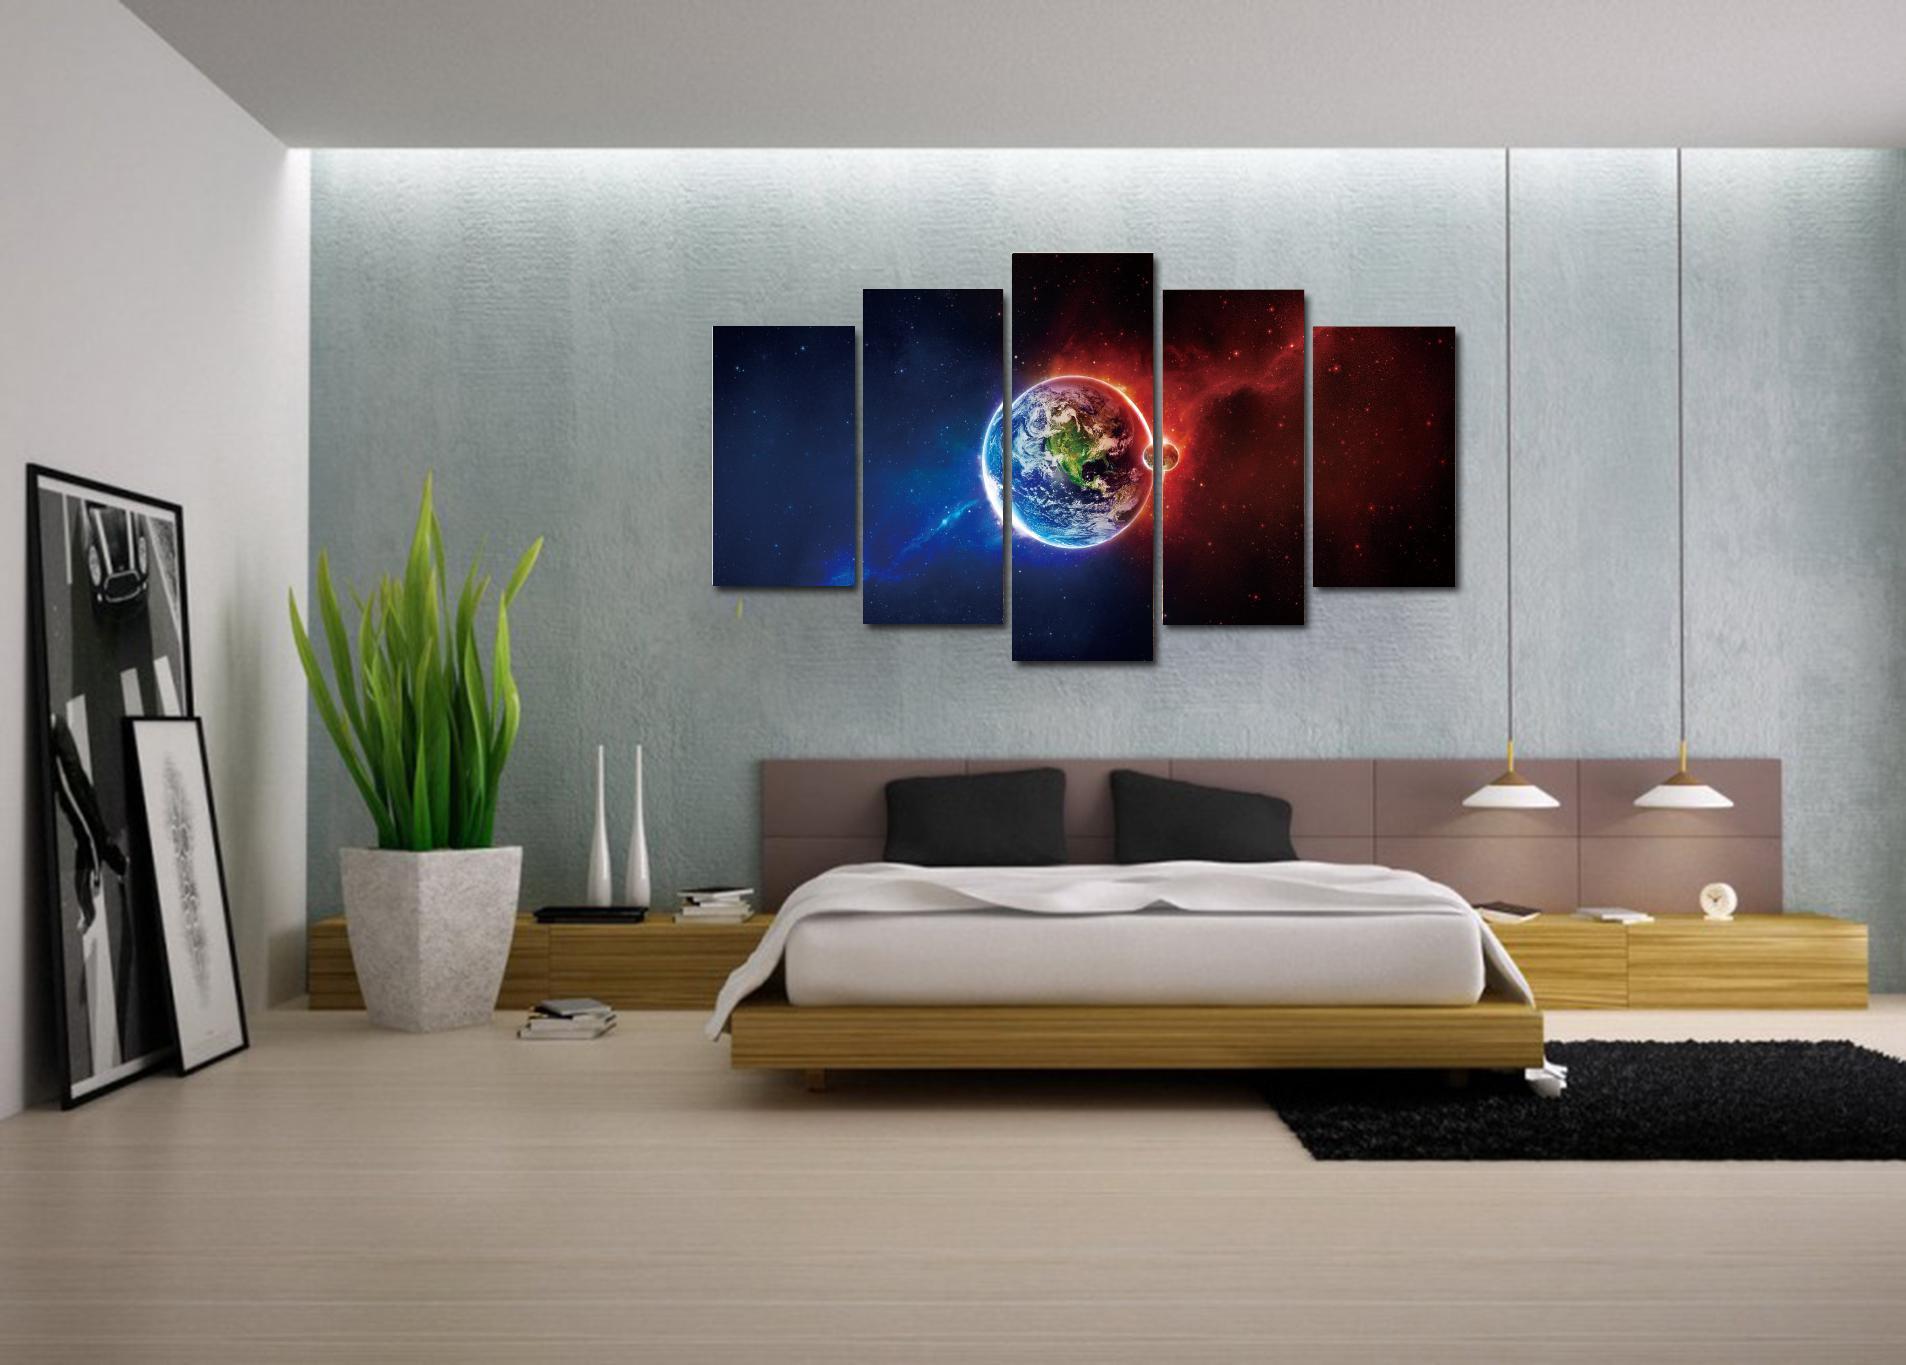 Outer Space Bedroom Outer Space Bedroom Bedroom Boy Room Ideas Artiques Outer Space